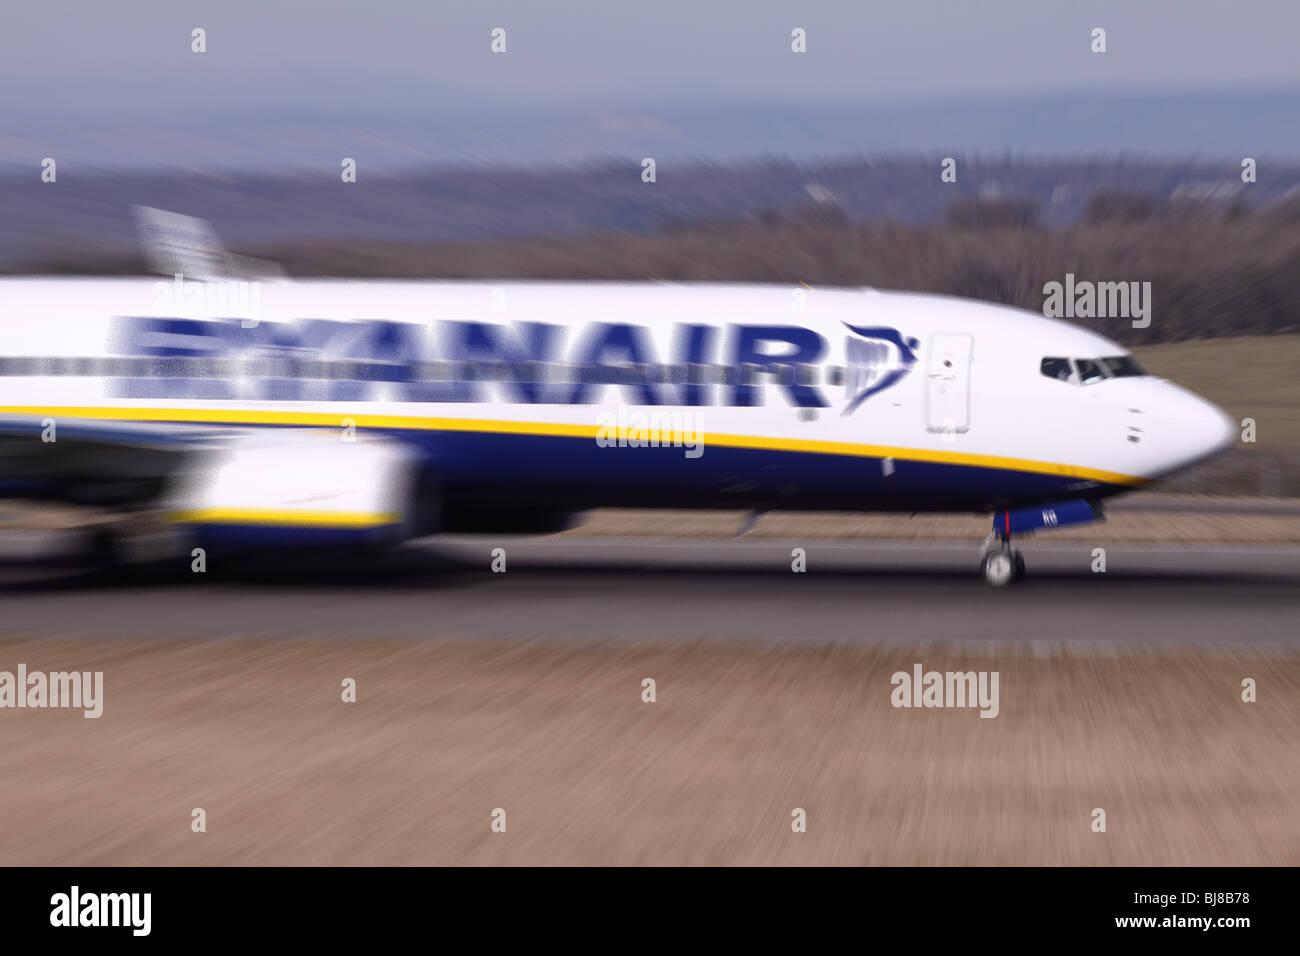 Ryanair plane Boeing 737 taking off motion blur Stock Photo